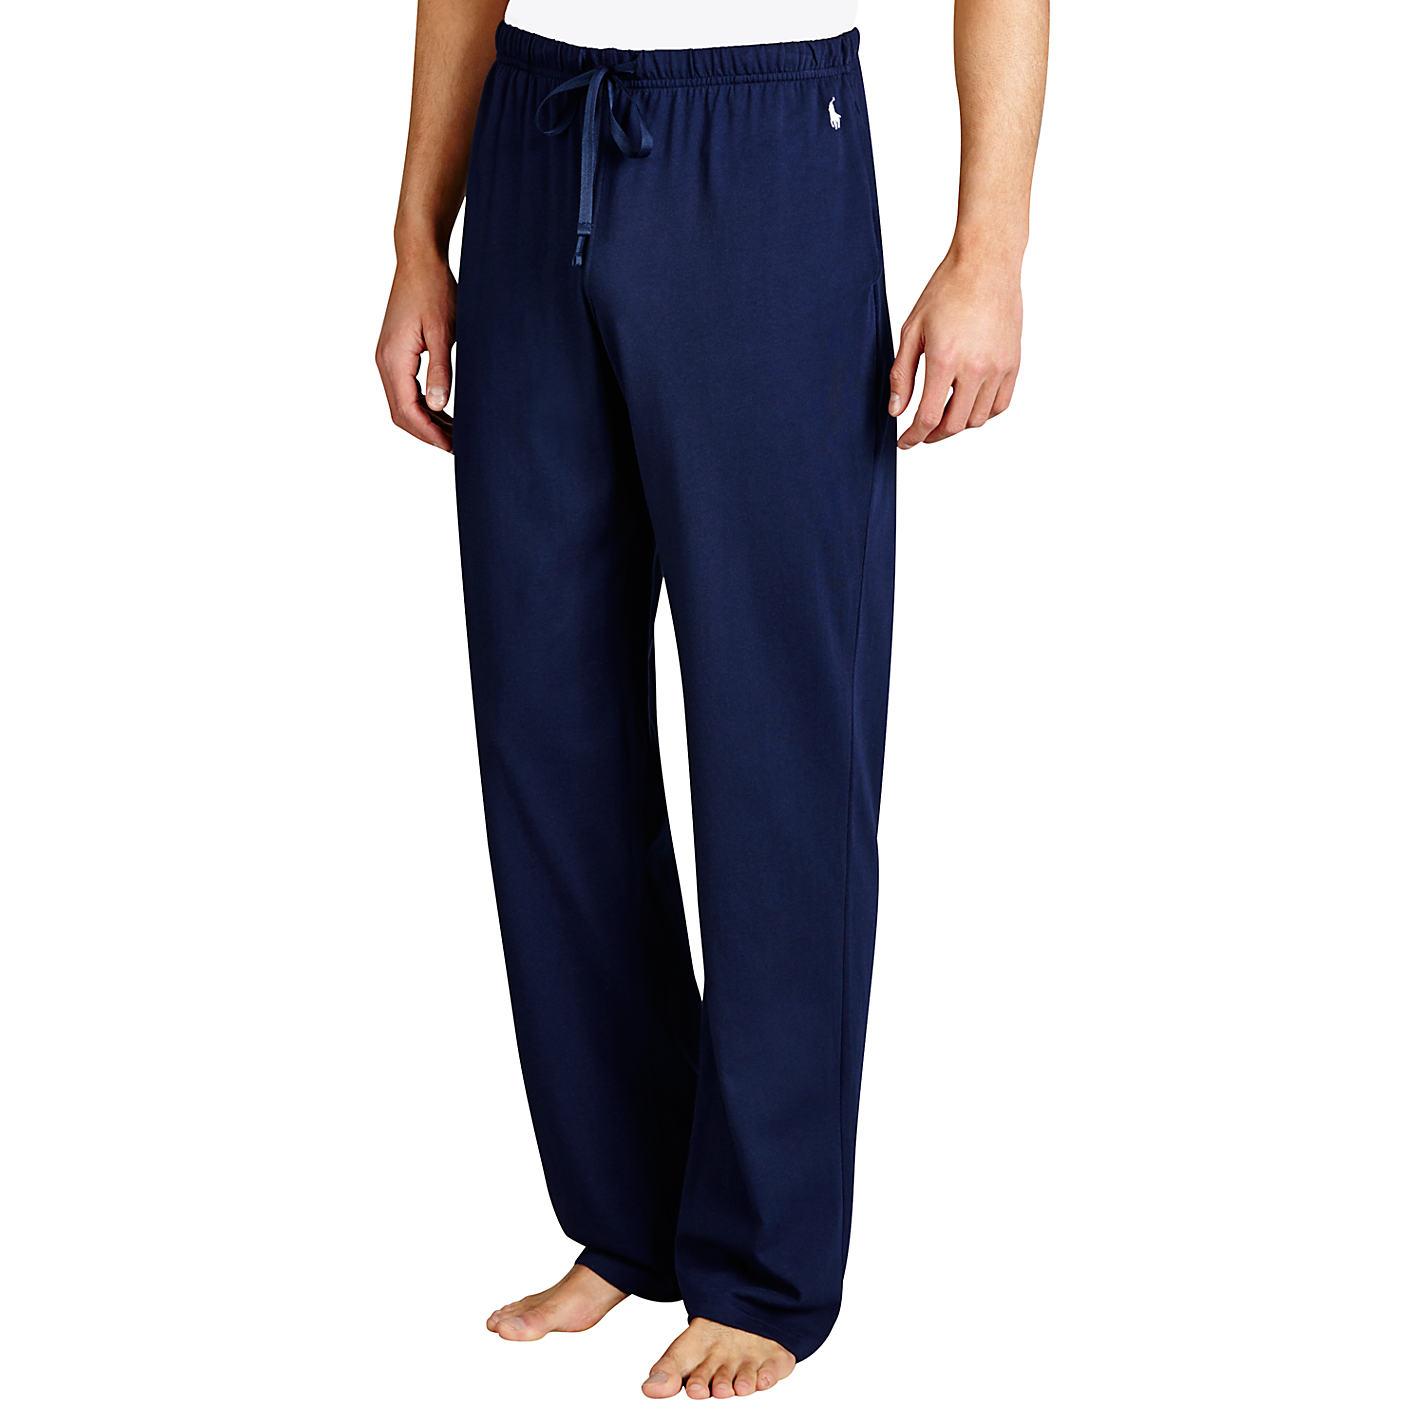 Buy Polo Ralph Lauren Basic Jersey Lounge Pants Navy John Lewis # Muebles Ralph Lauren Espana